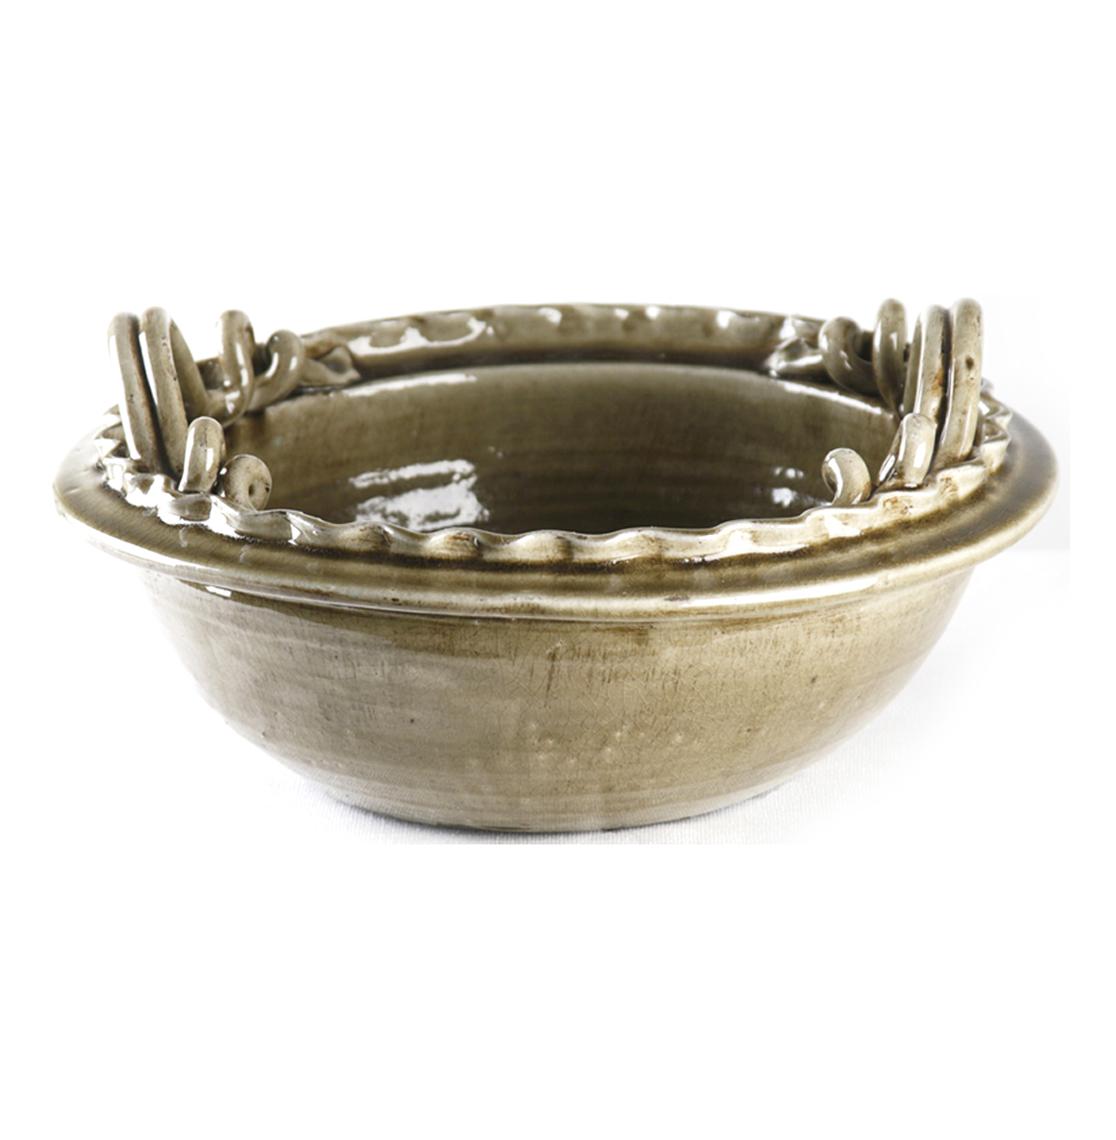 Athenaeum Earthenware Double Handled Deep Bowl